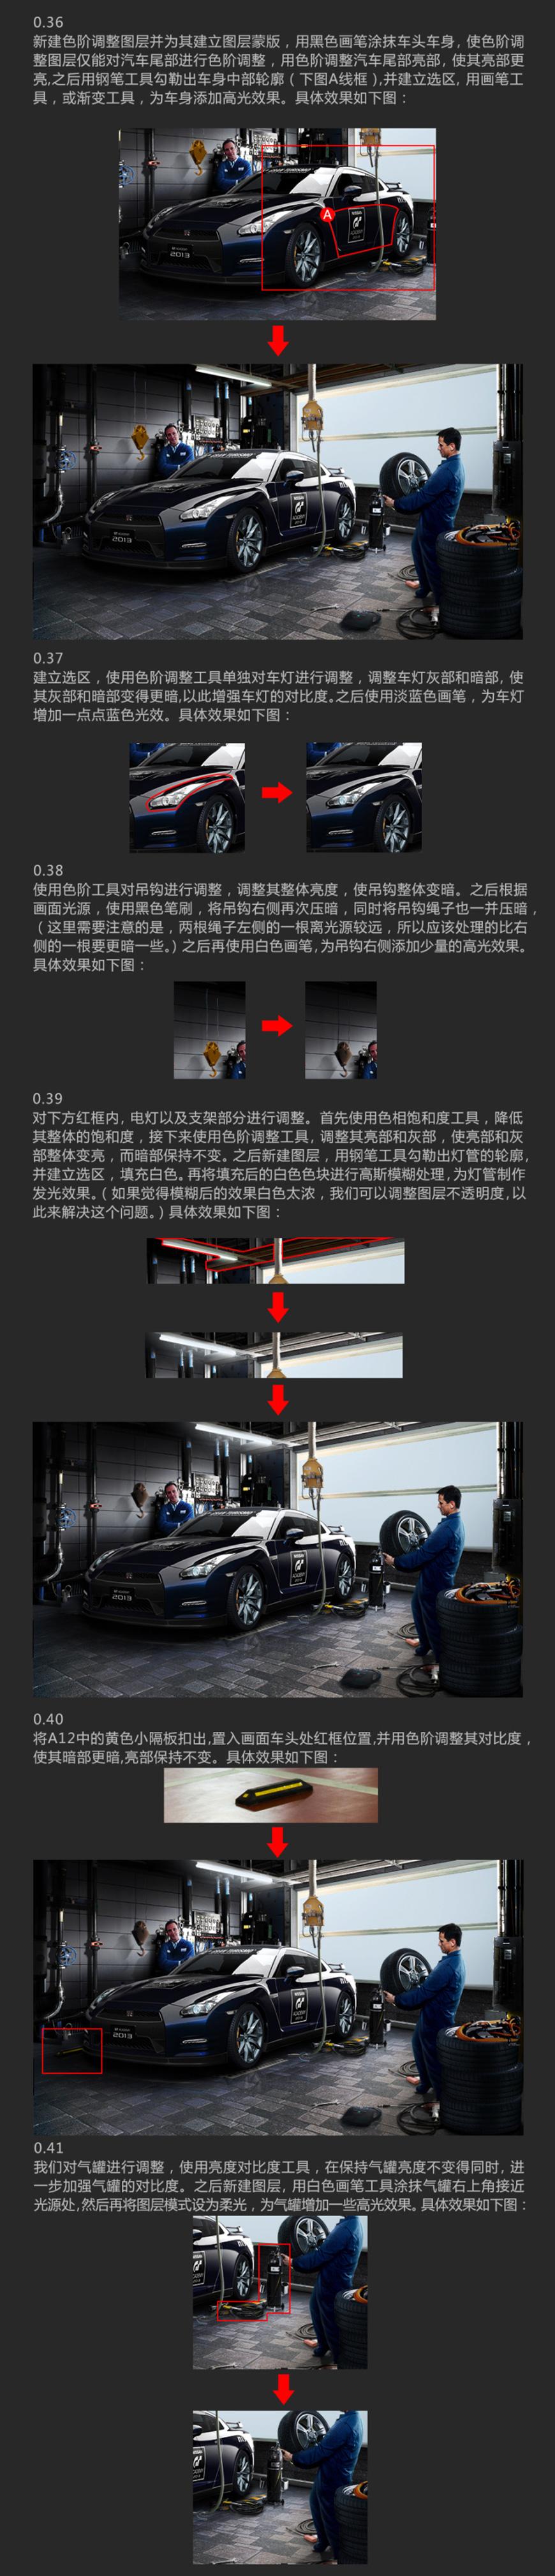 PS教程!GTR赛车广告海报合成